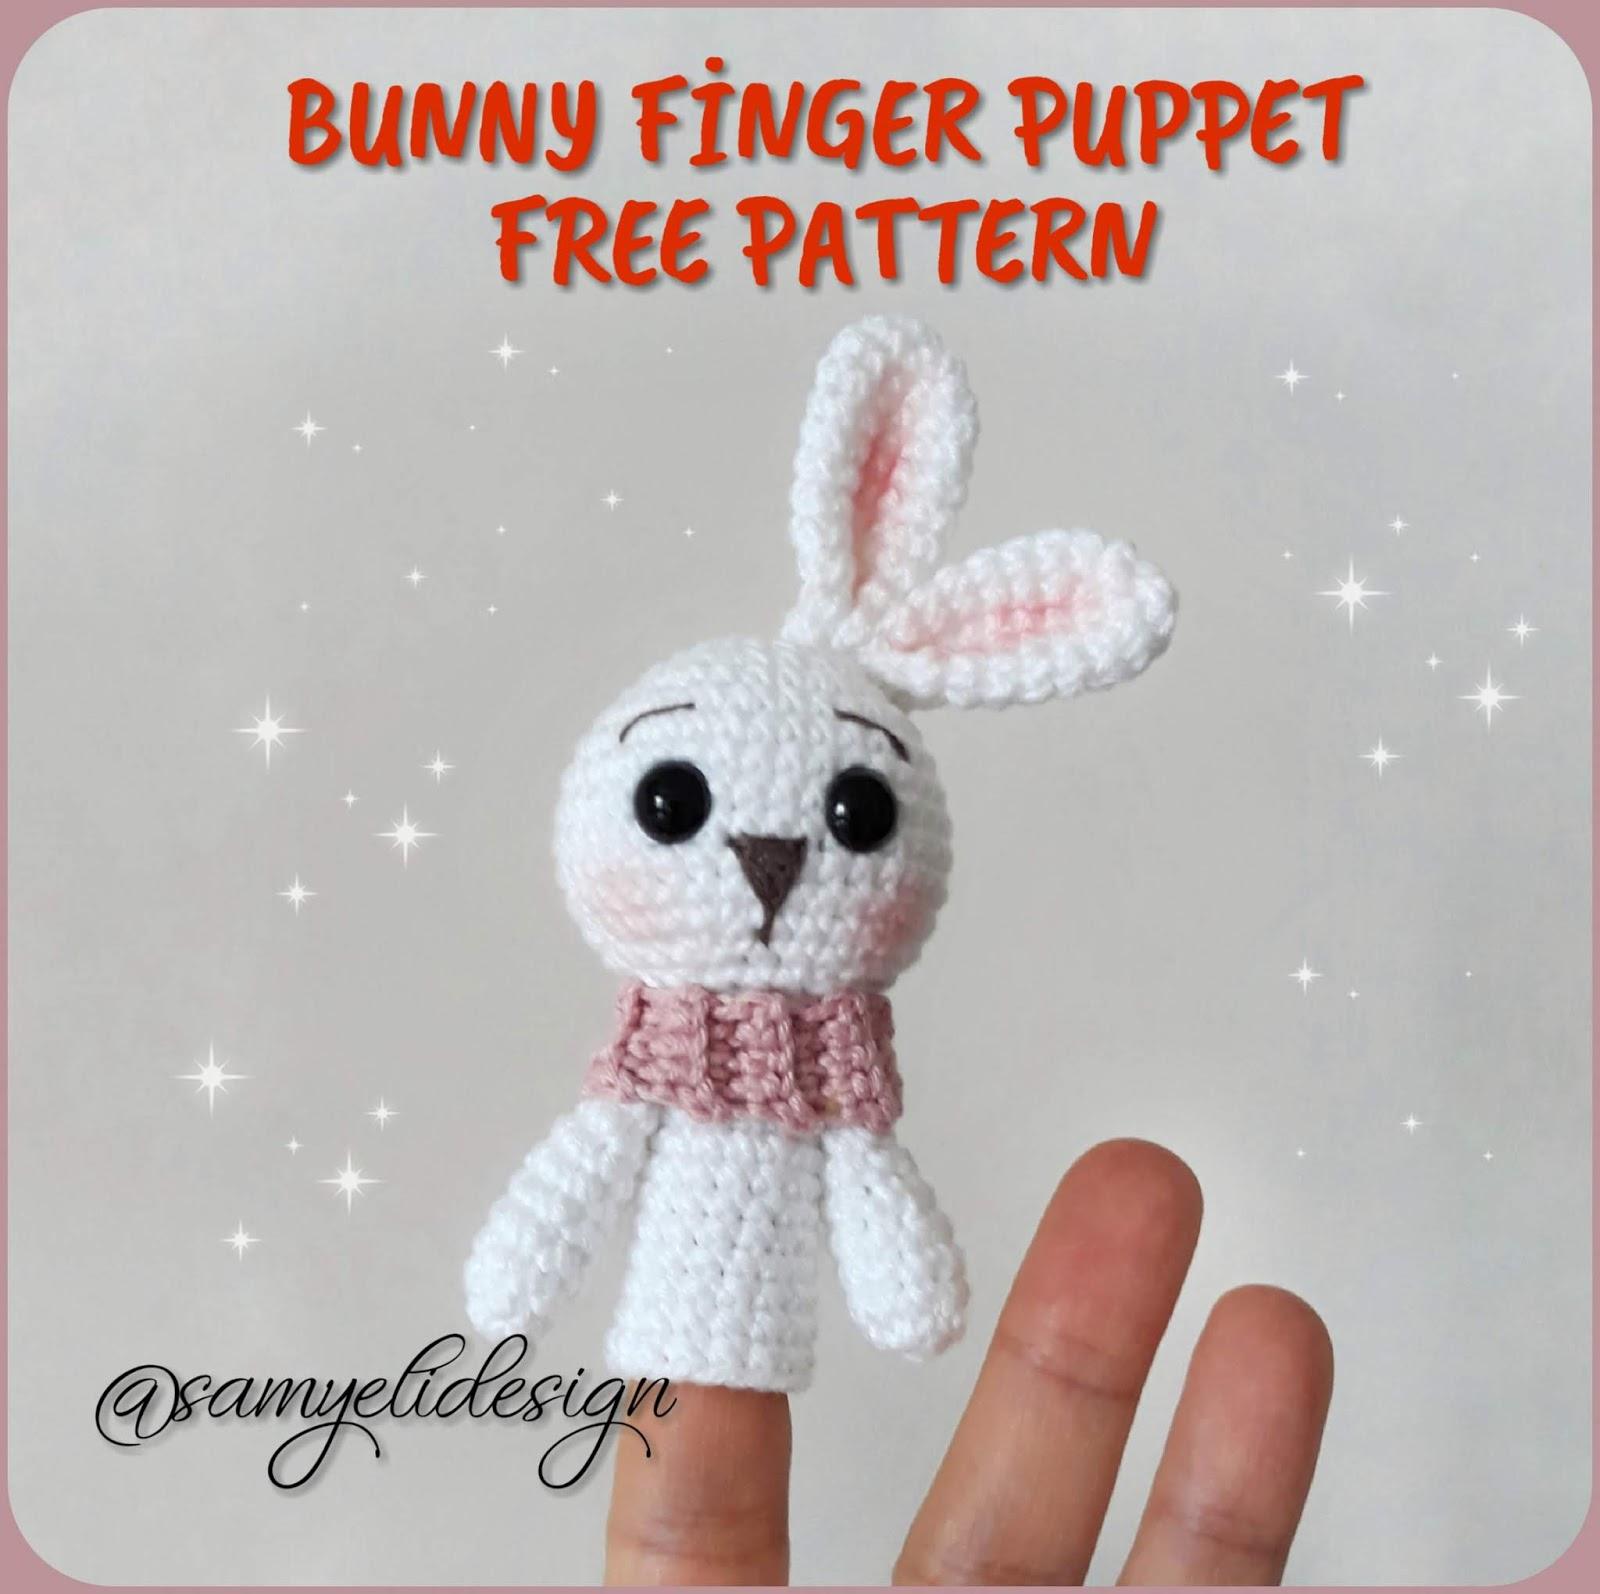 63 Free Crochet Bunny Amigurumi Patterns ⋆ DIY Crafts | 1594x1600